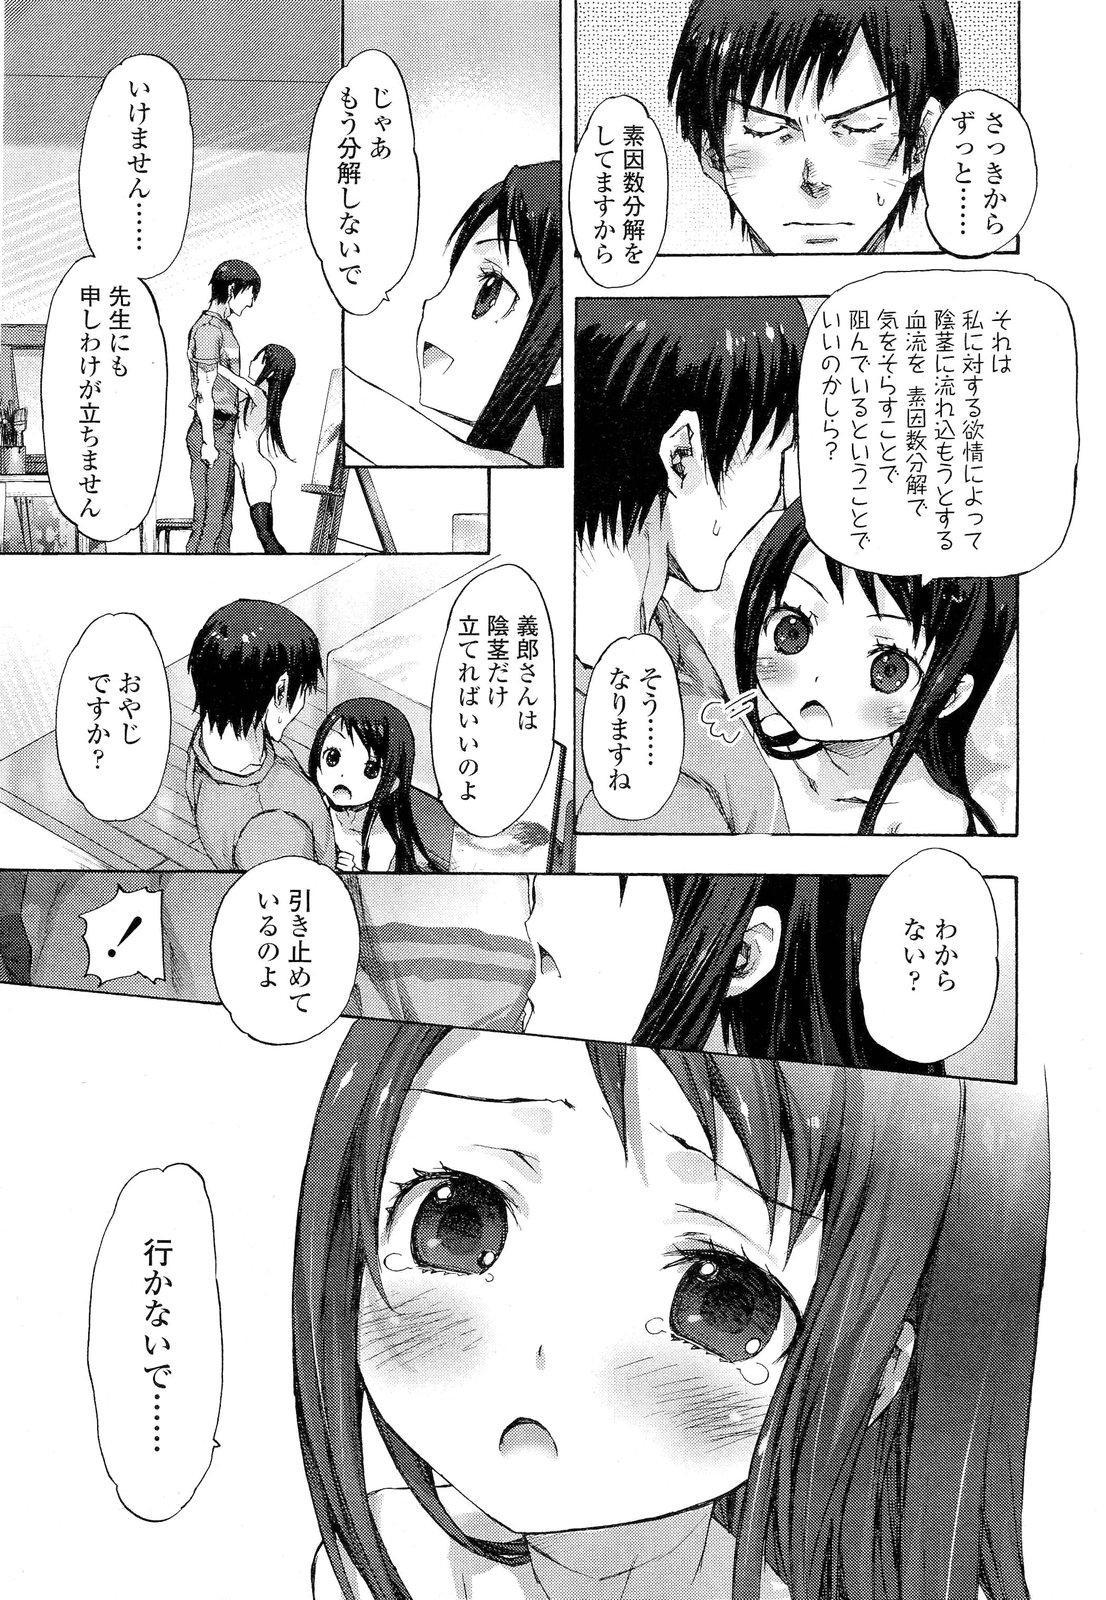 COMIC LO 2012-05 Vol. 98 16